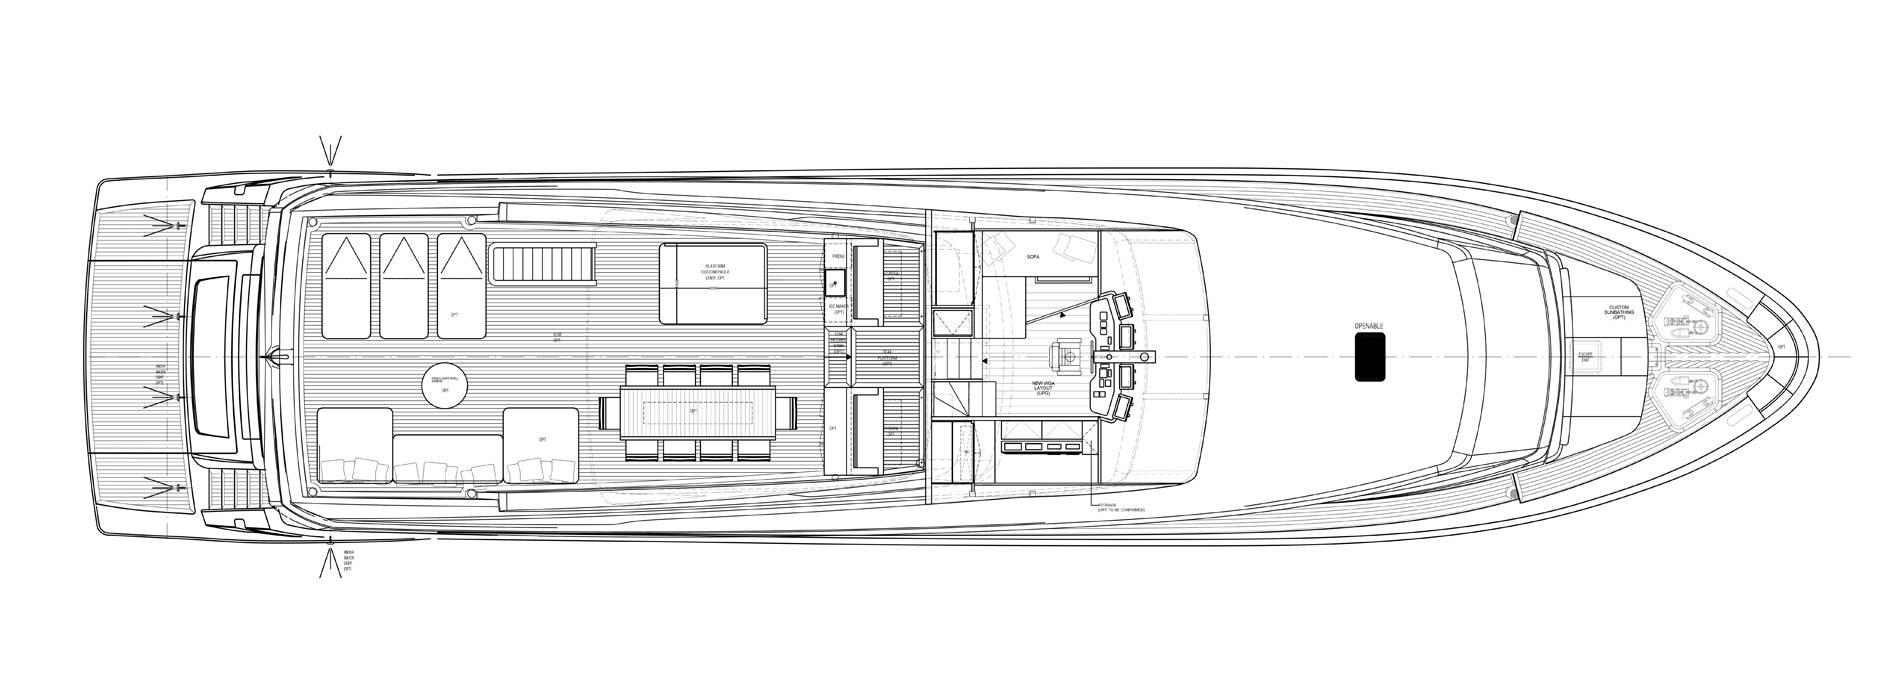 Sanlorenzo Yachts SL106-725 Flying bridge